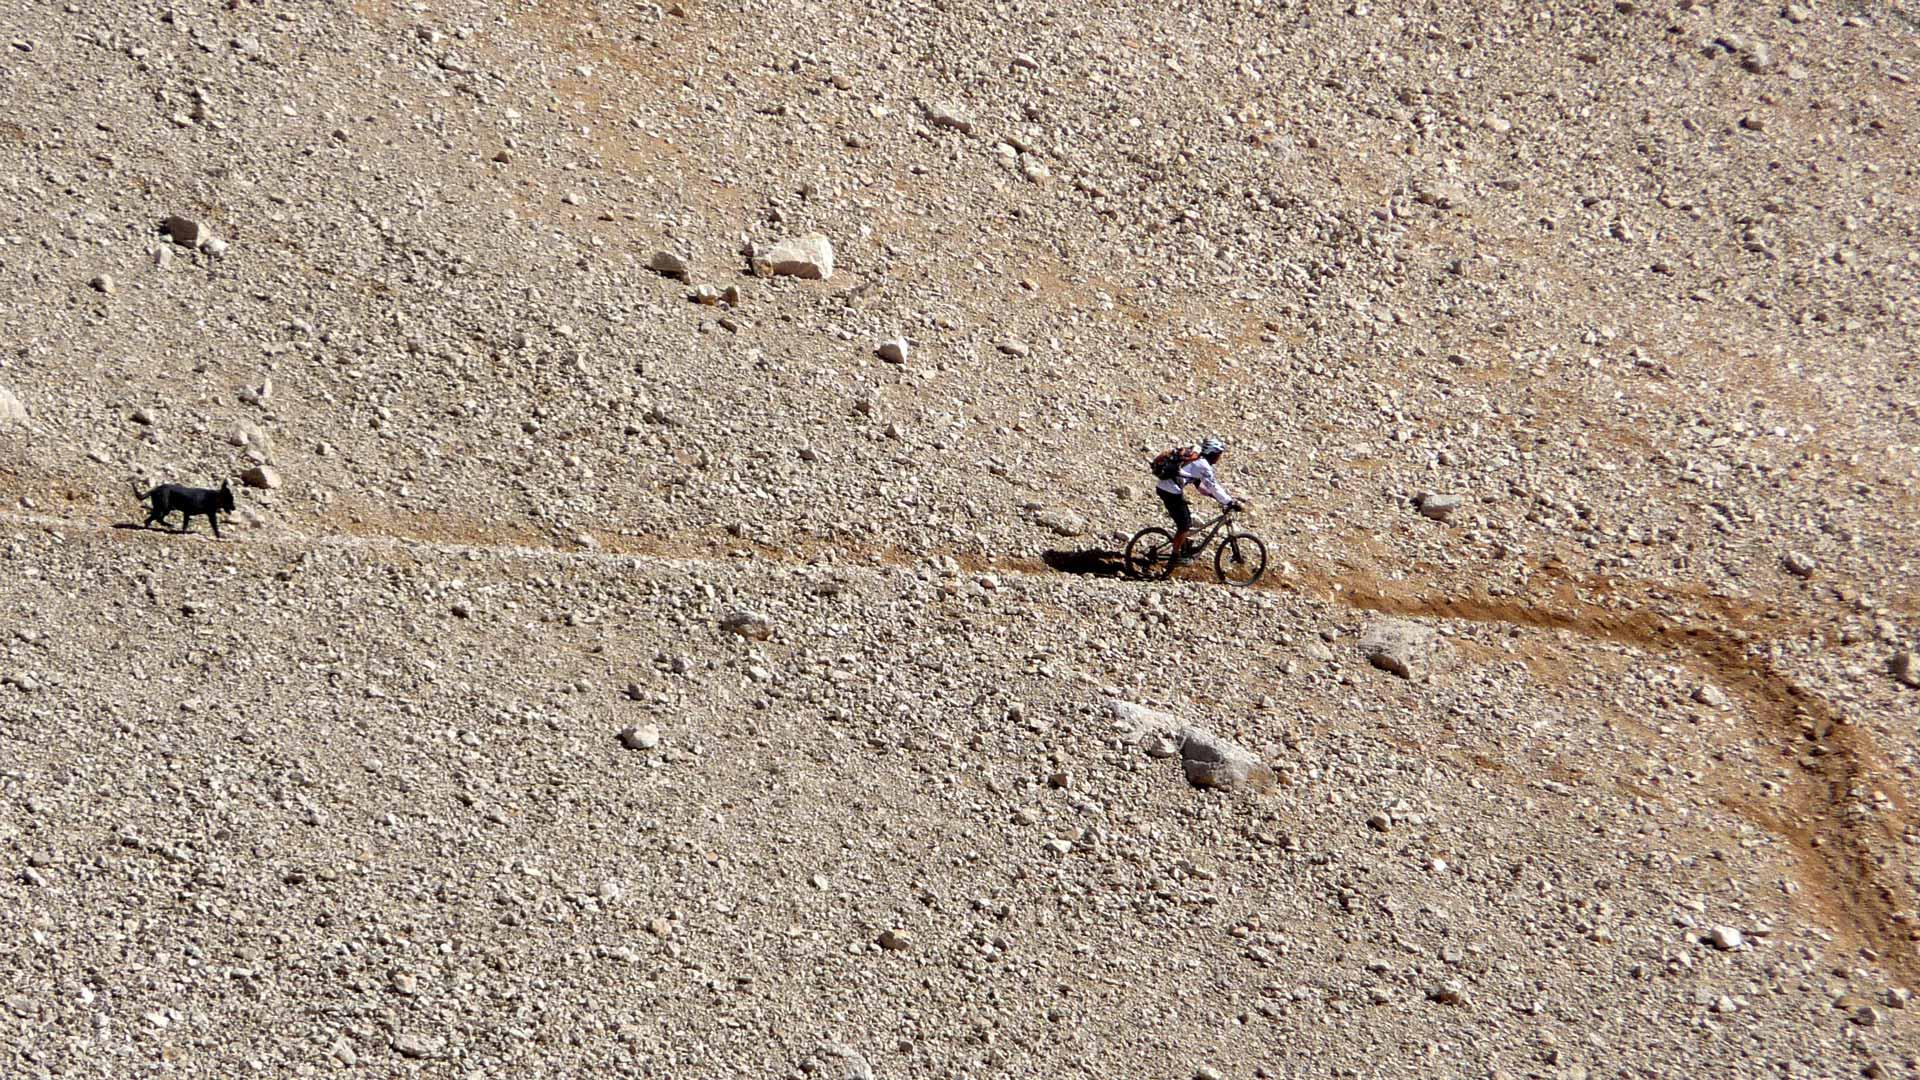 HOHER TAURUS, Nigde/ ALADAGLAR: Trecking bergauf kombiniert mit heftigem Downhill